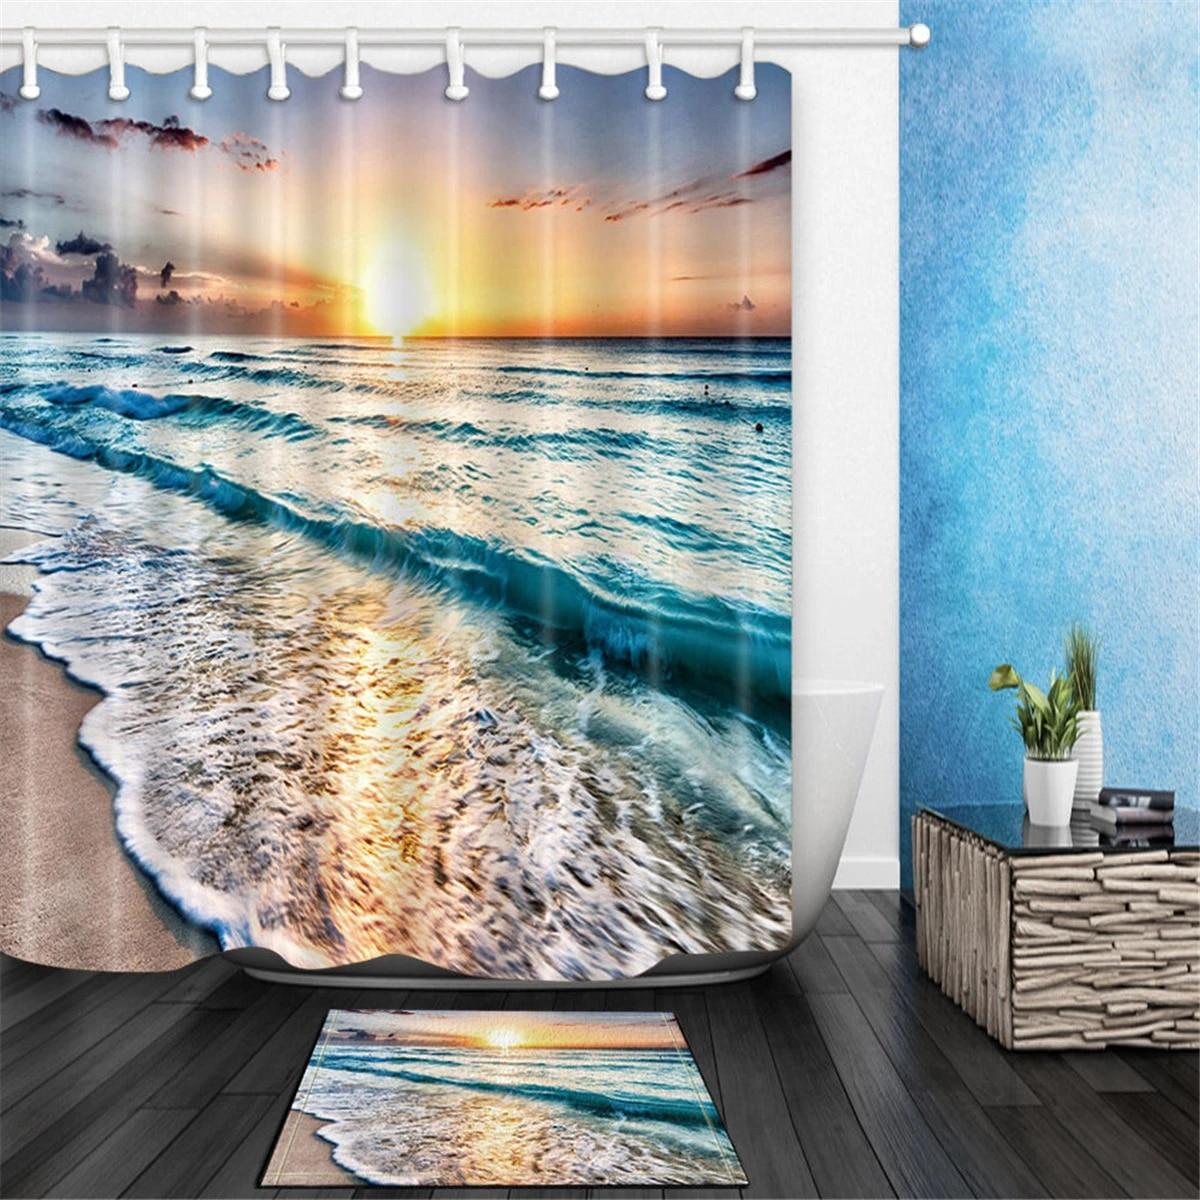 Bathroom Shower Curtain Bath Mat Top Selling Ocean Nautical Coastal Beach Sunset Bathroom Fabric Shower Curtain Set With Hook Shower Curtains Aliexpress